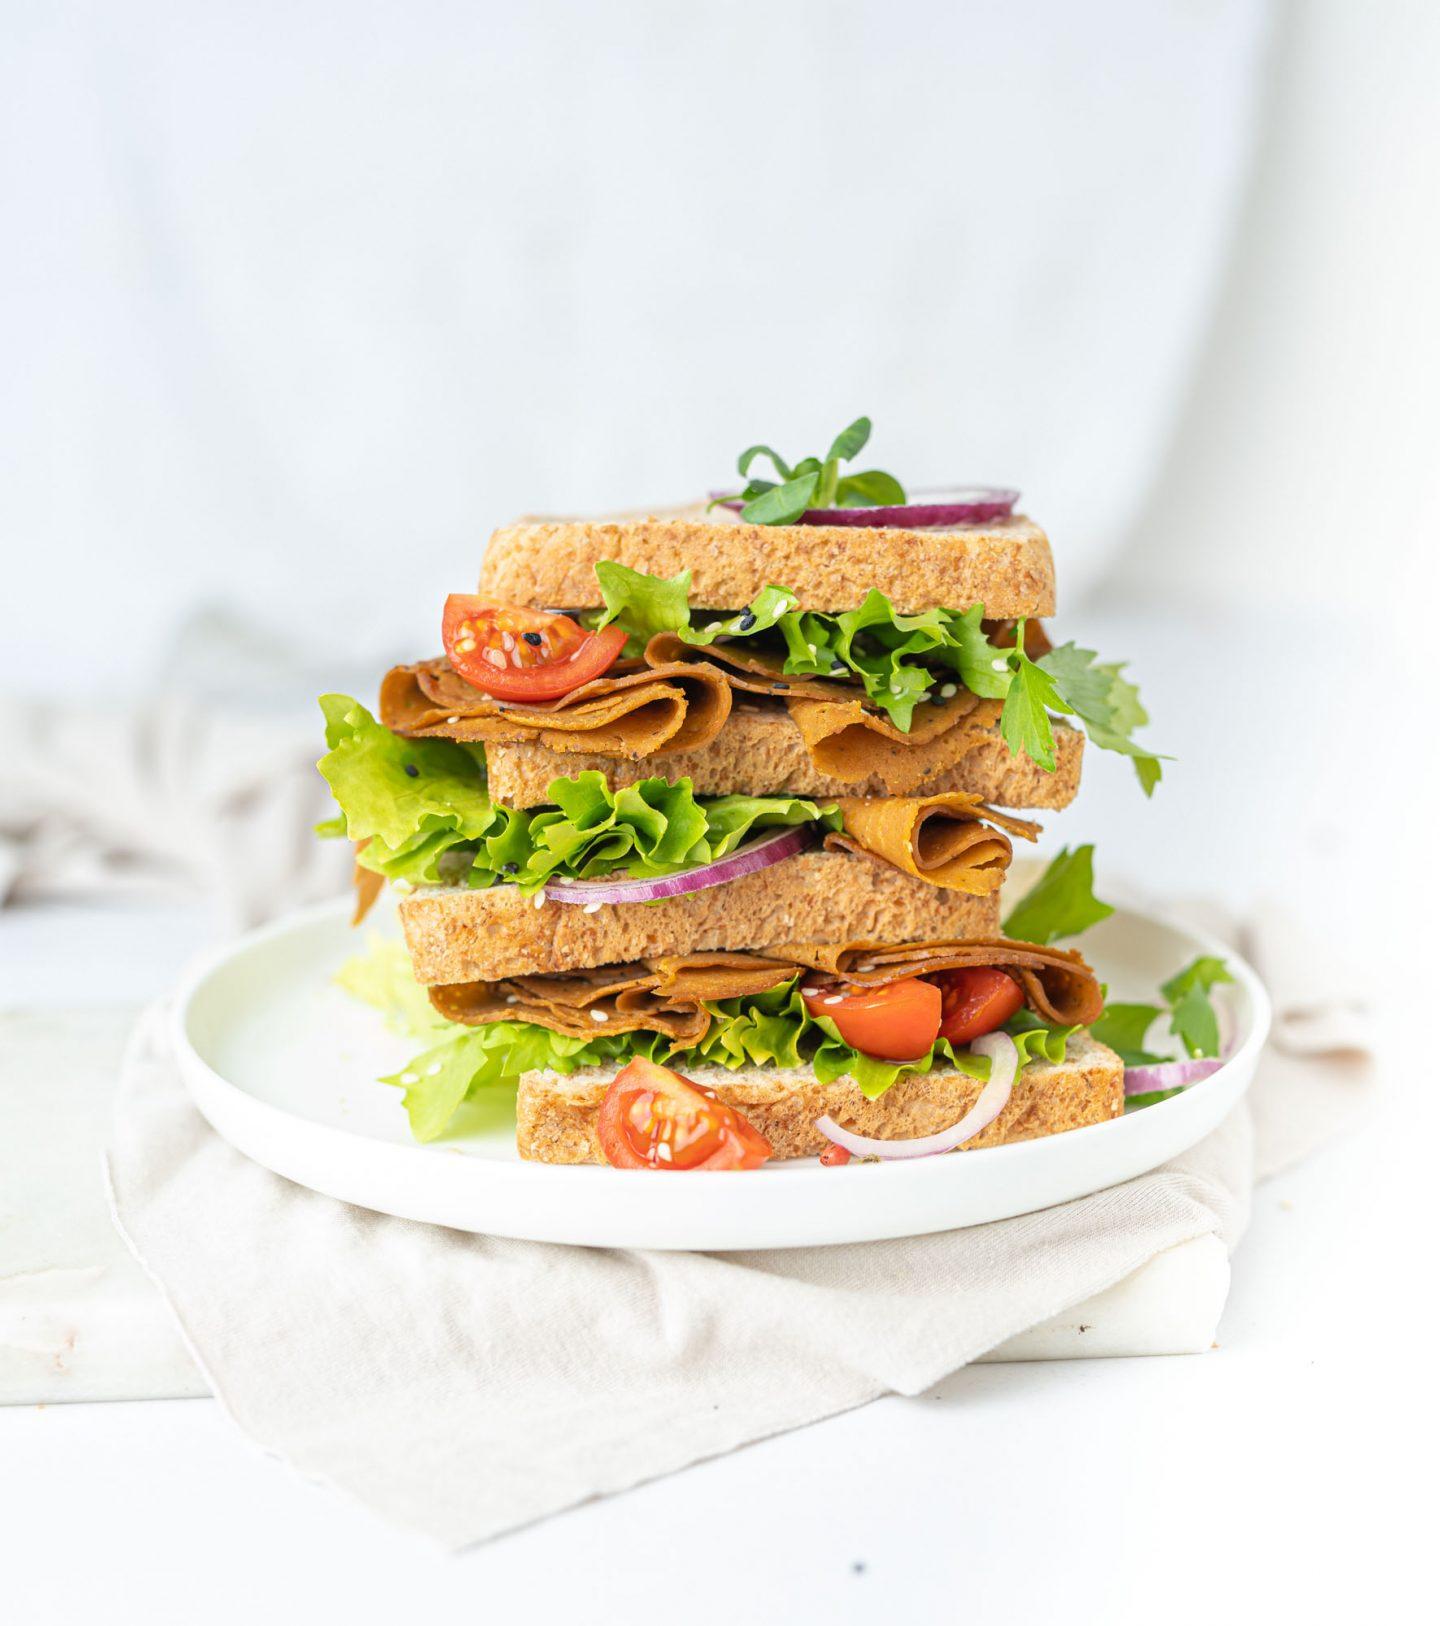 marija rukavina photography vegan sandwich